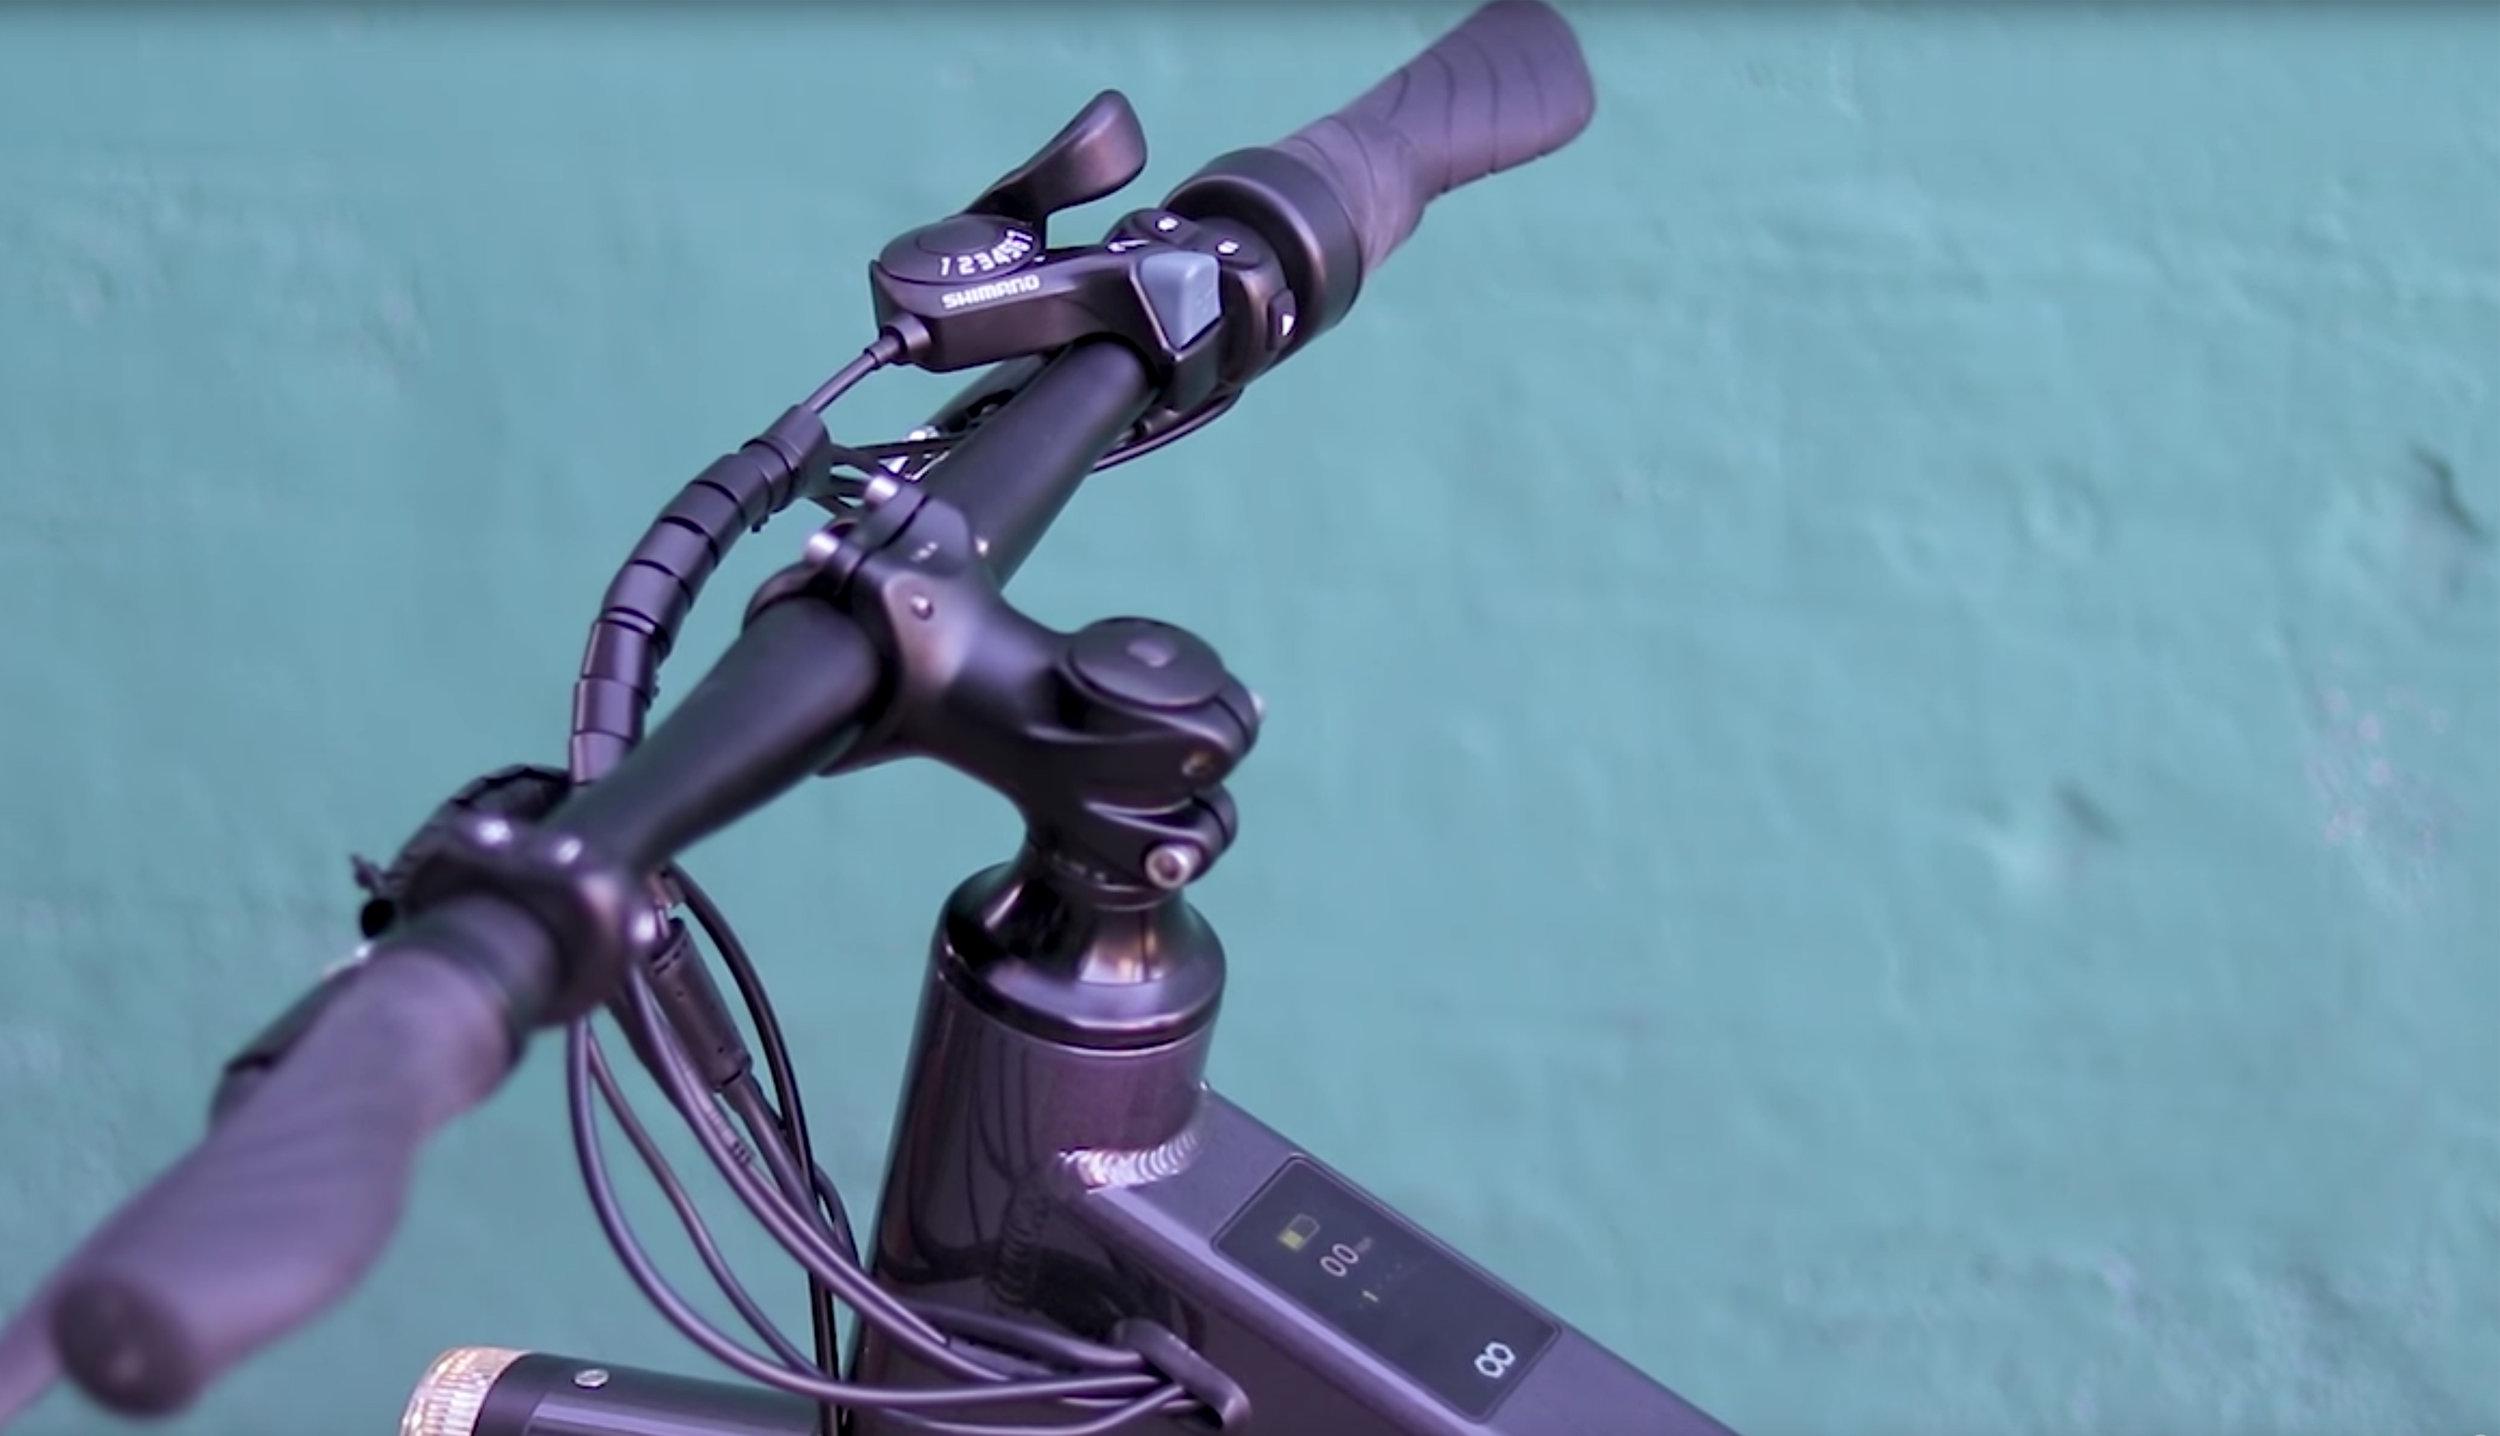 electrified-reviews-flash-v1-electric-bike-review-handlebars.jpg